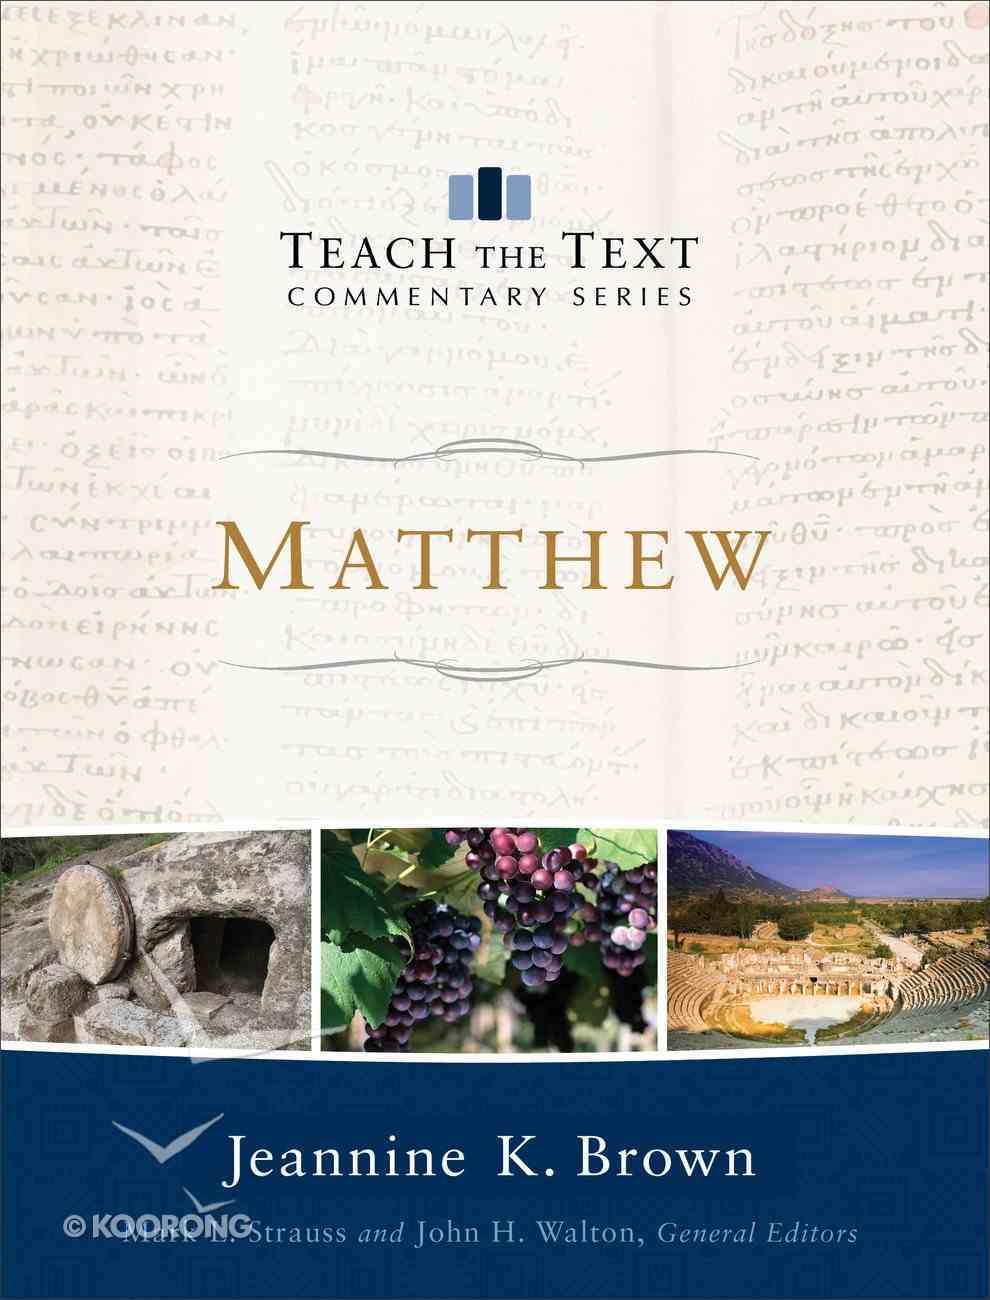 Matthew (Teach The Text Commentary Series) eBook